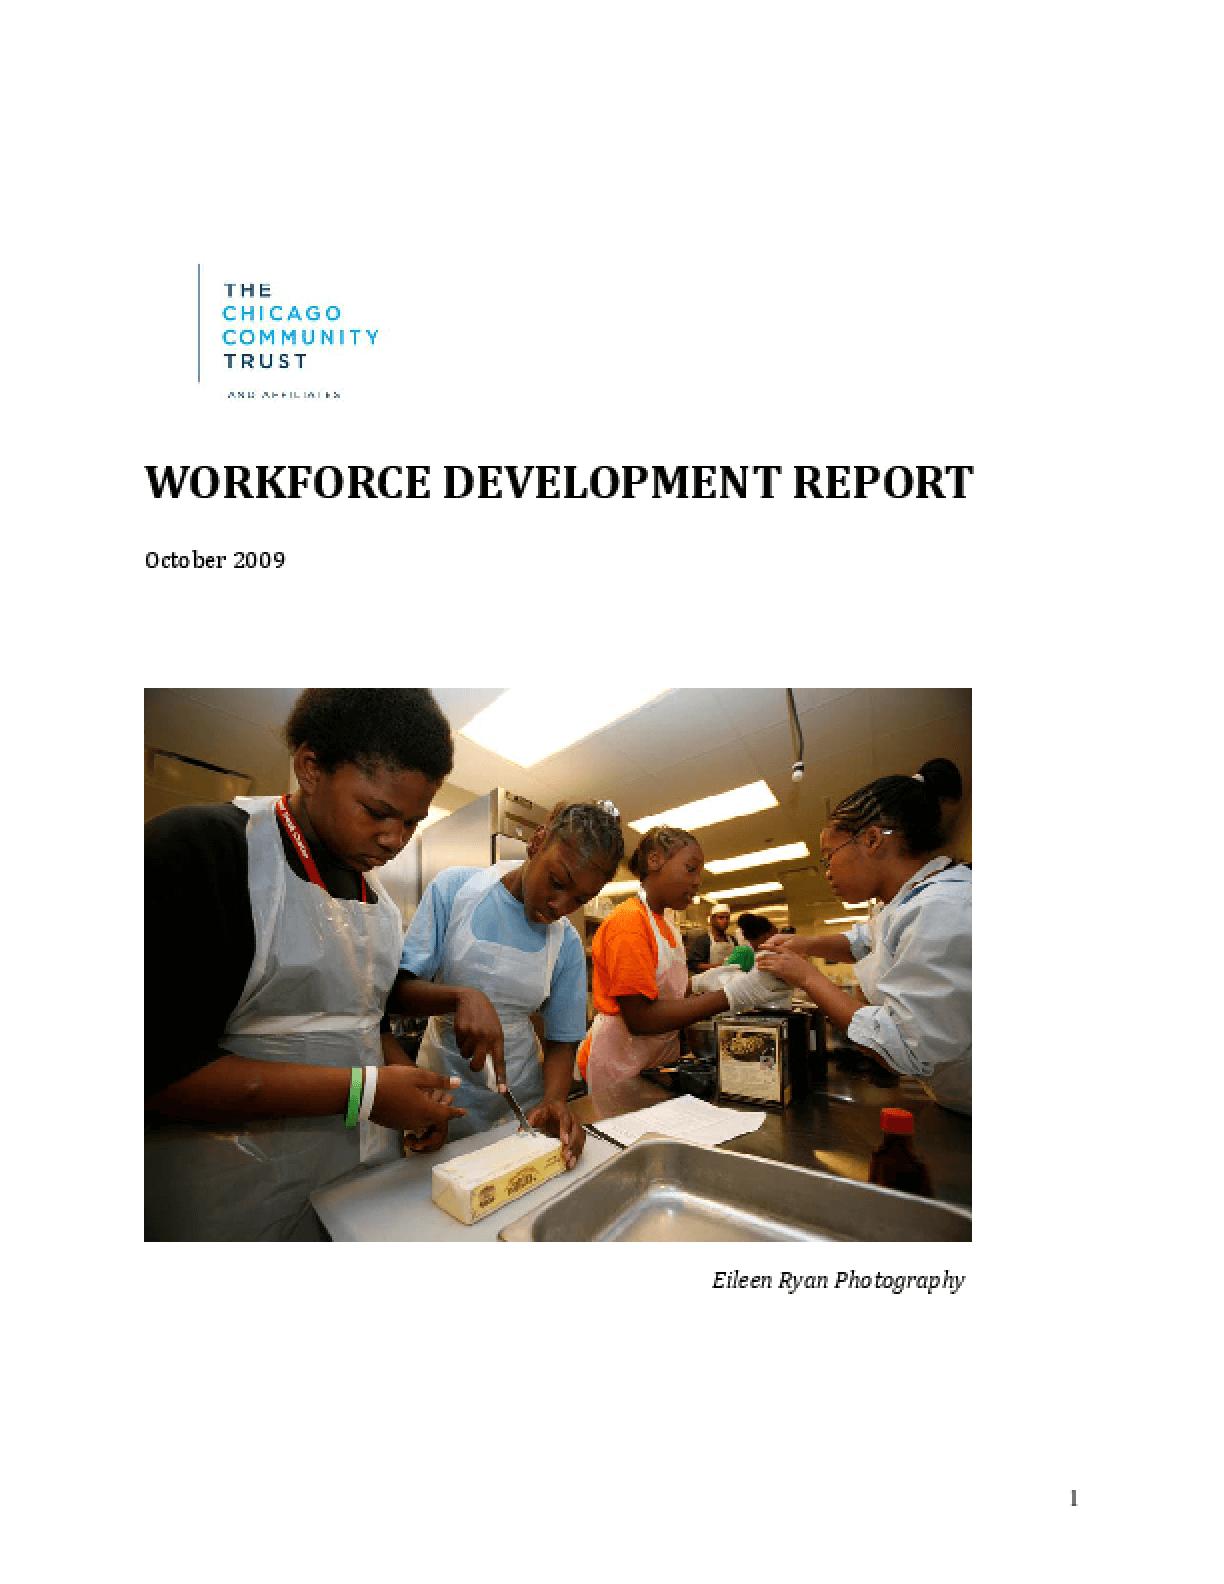 Workforce Development Report